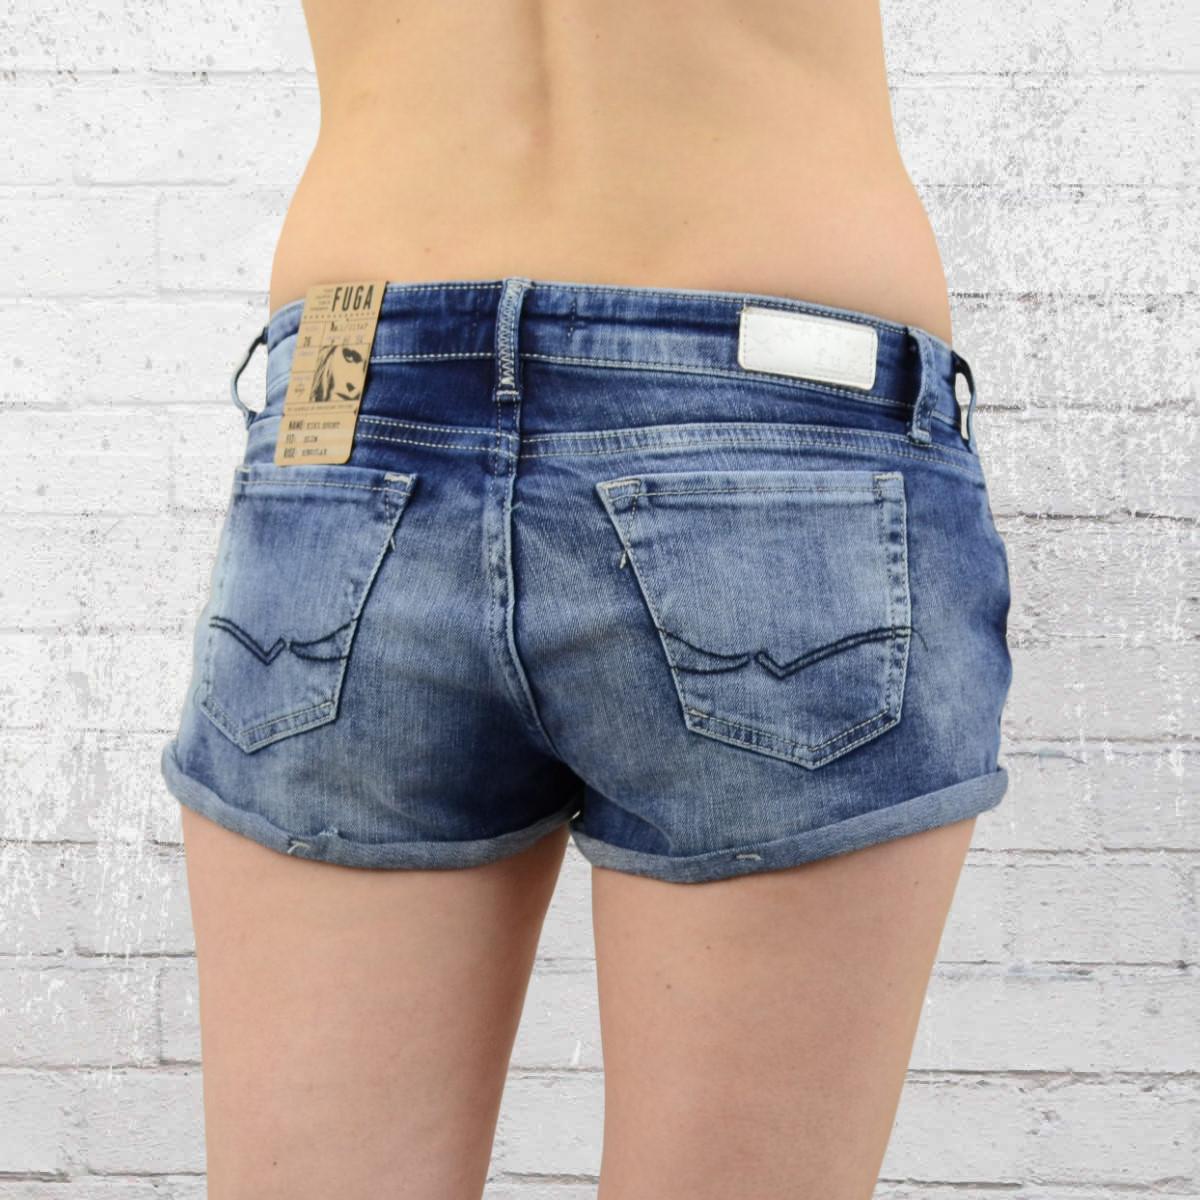 jetzt bestellen fuga denim jeans shorts damen kiki hot pant blau krasse. Black Bedroom Furniture Sets. Home Design Ideas